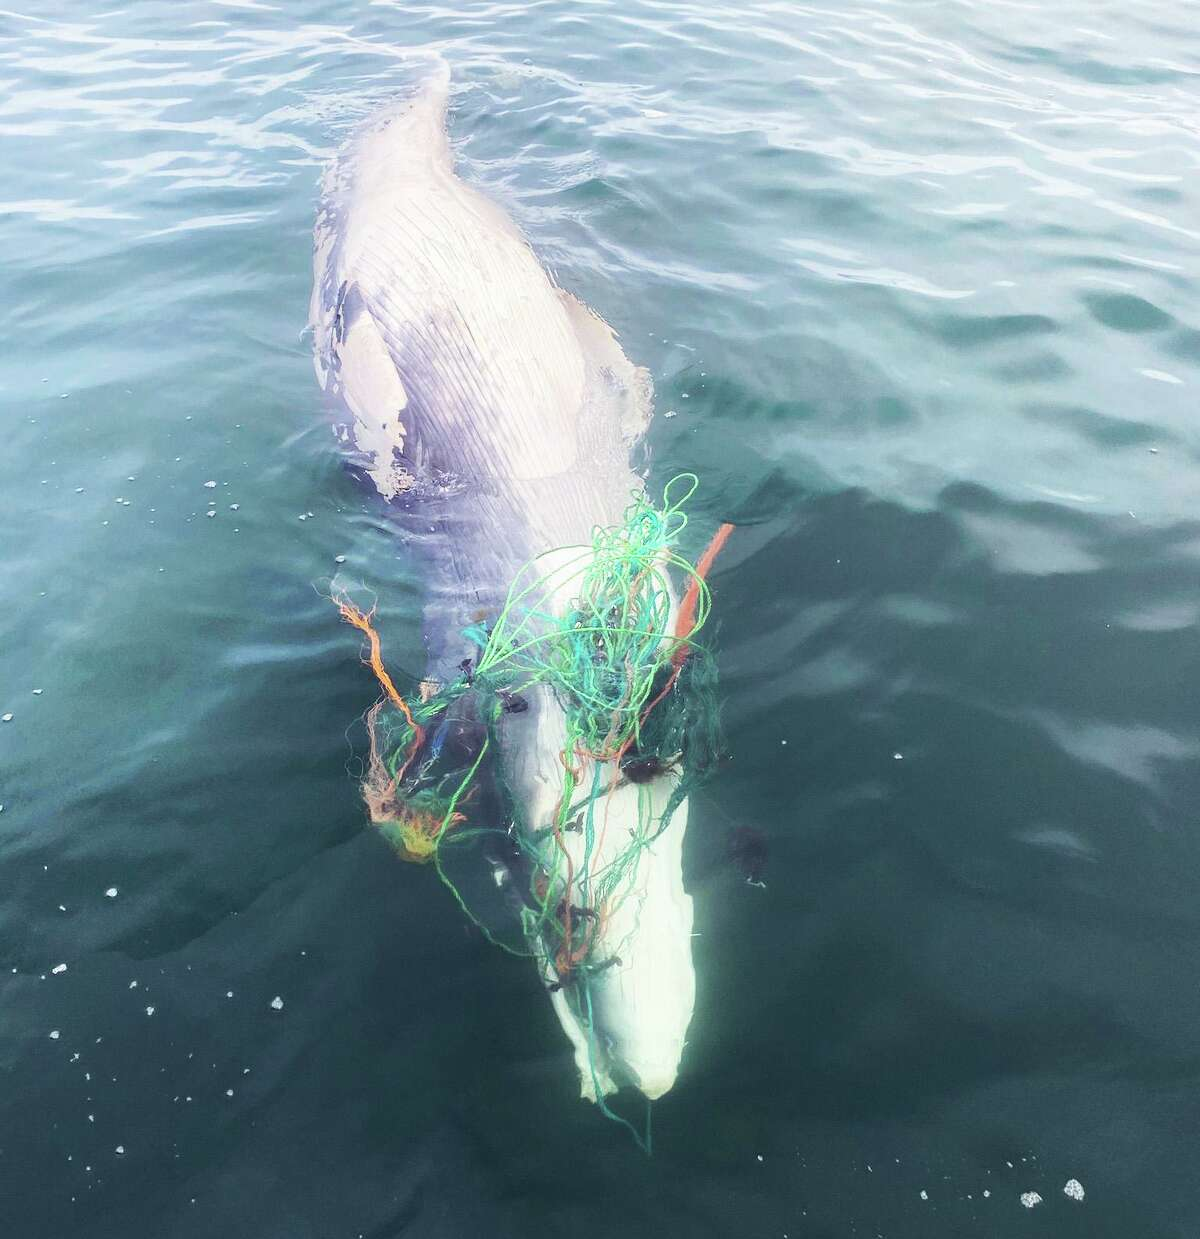 A dead minke whale was found entangled in gear off the Rhode Island coast this week. Mystic Aquarium crews helped free the carcass.